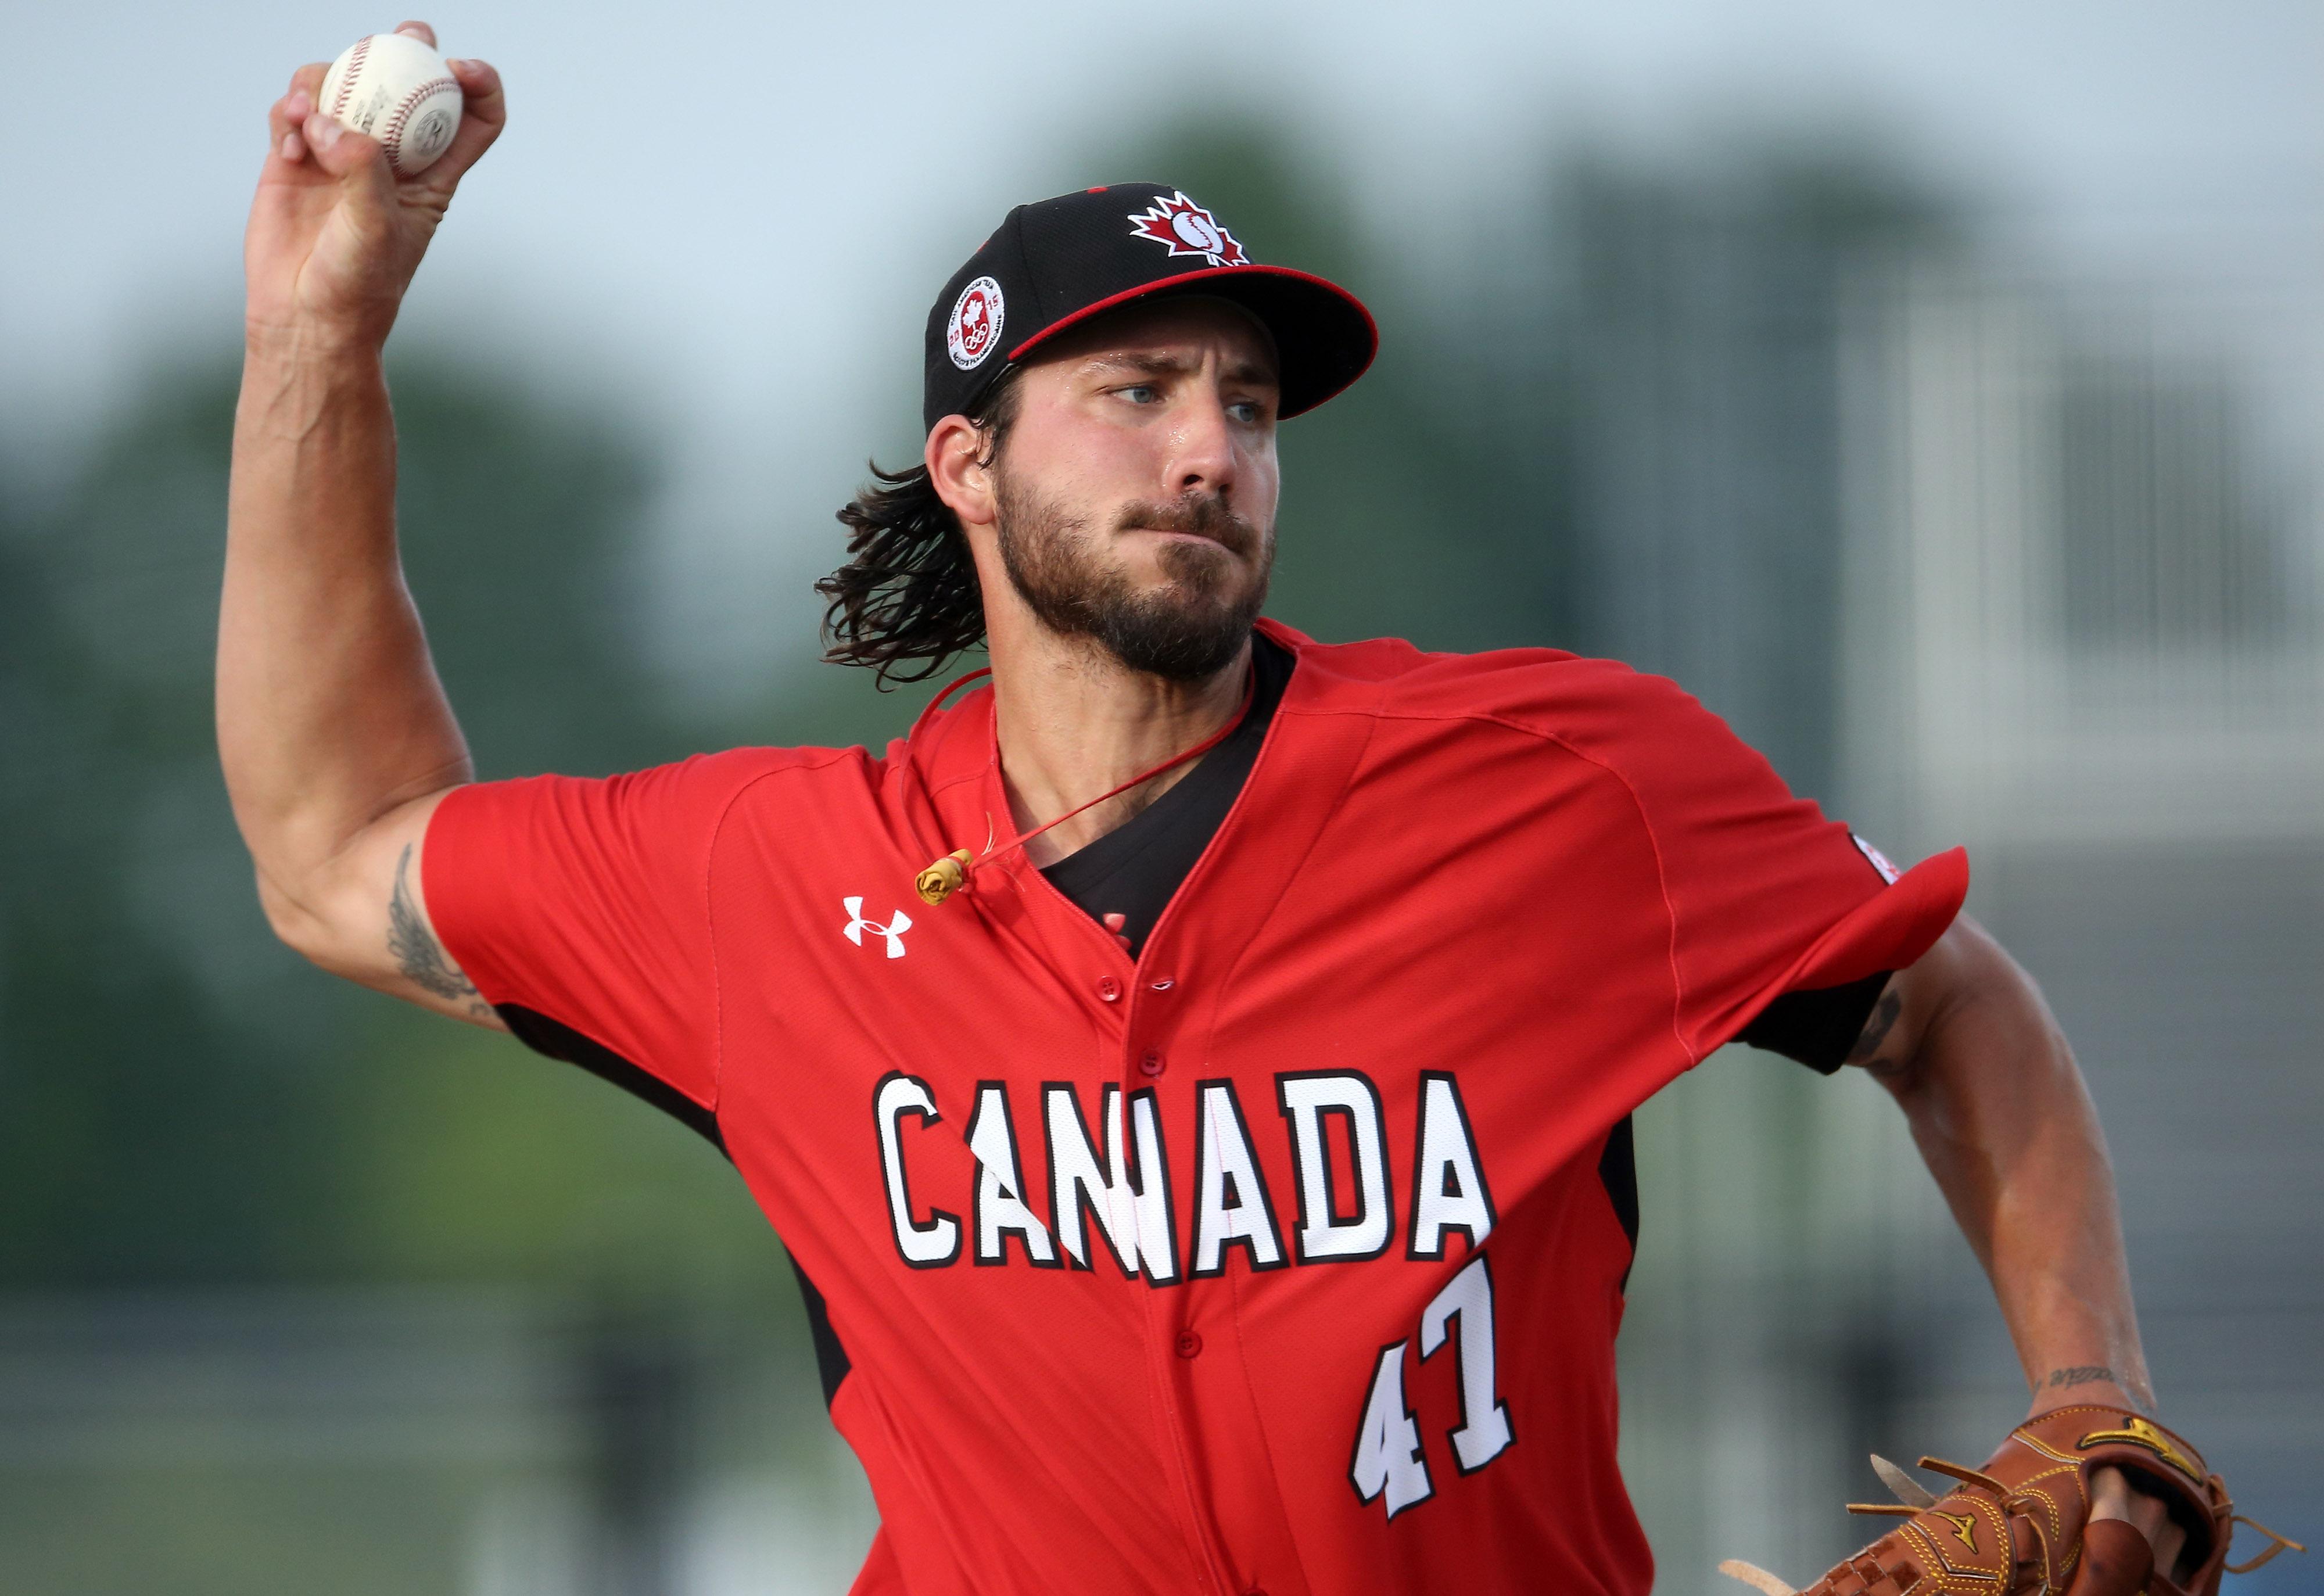 Pan Am Games: Baseball-Puerto Rico vs Canada